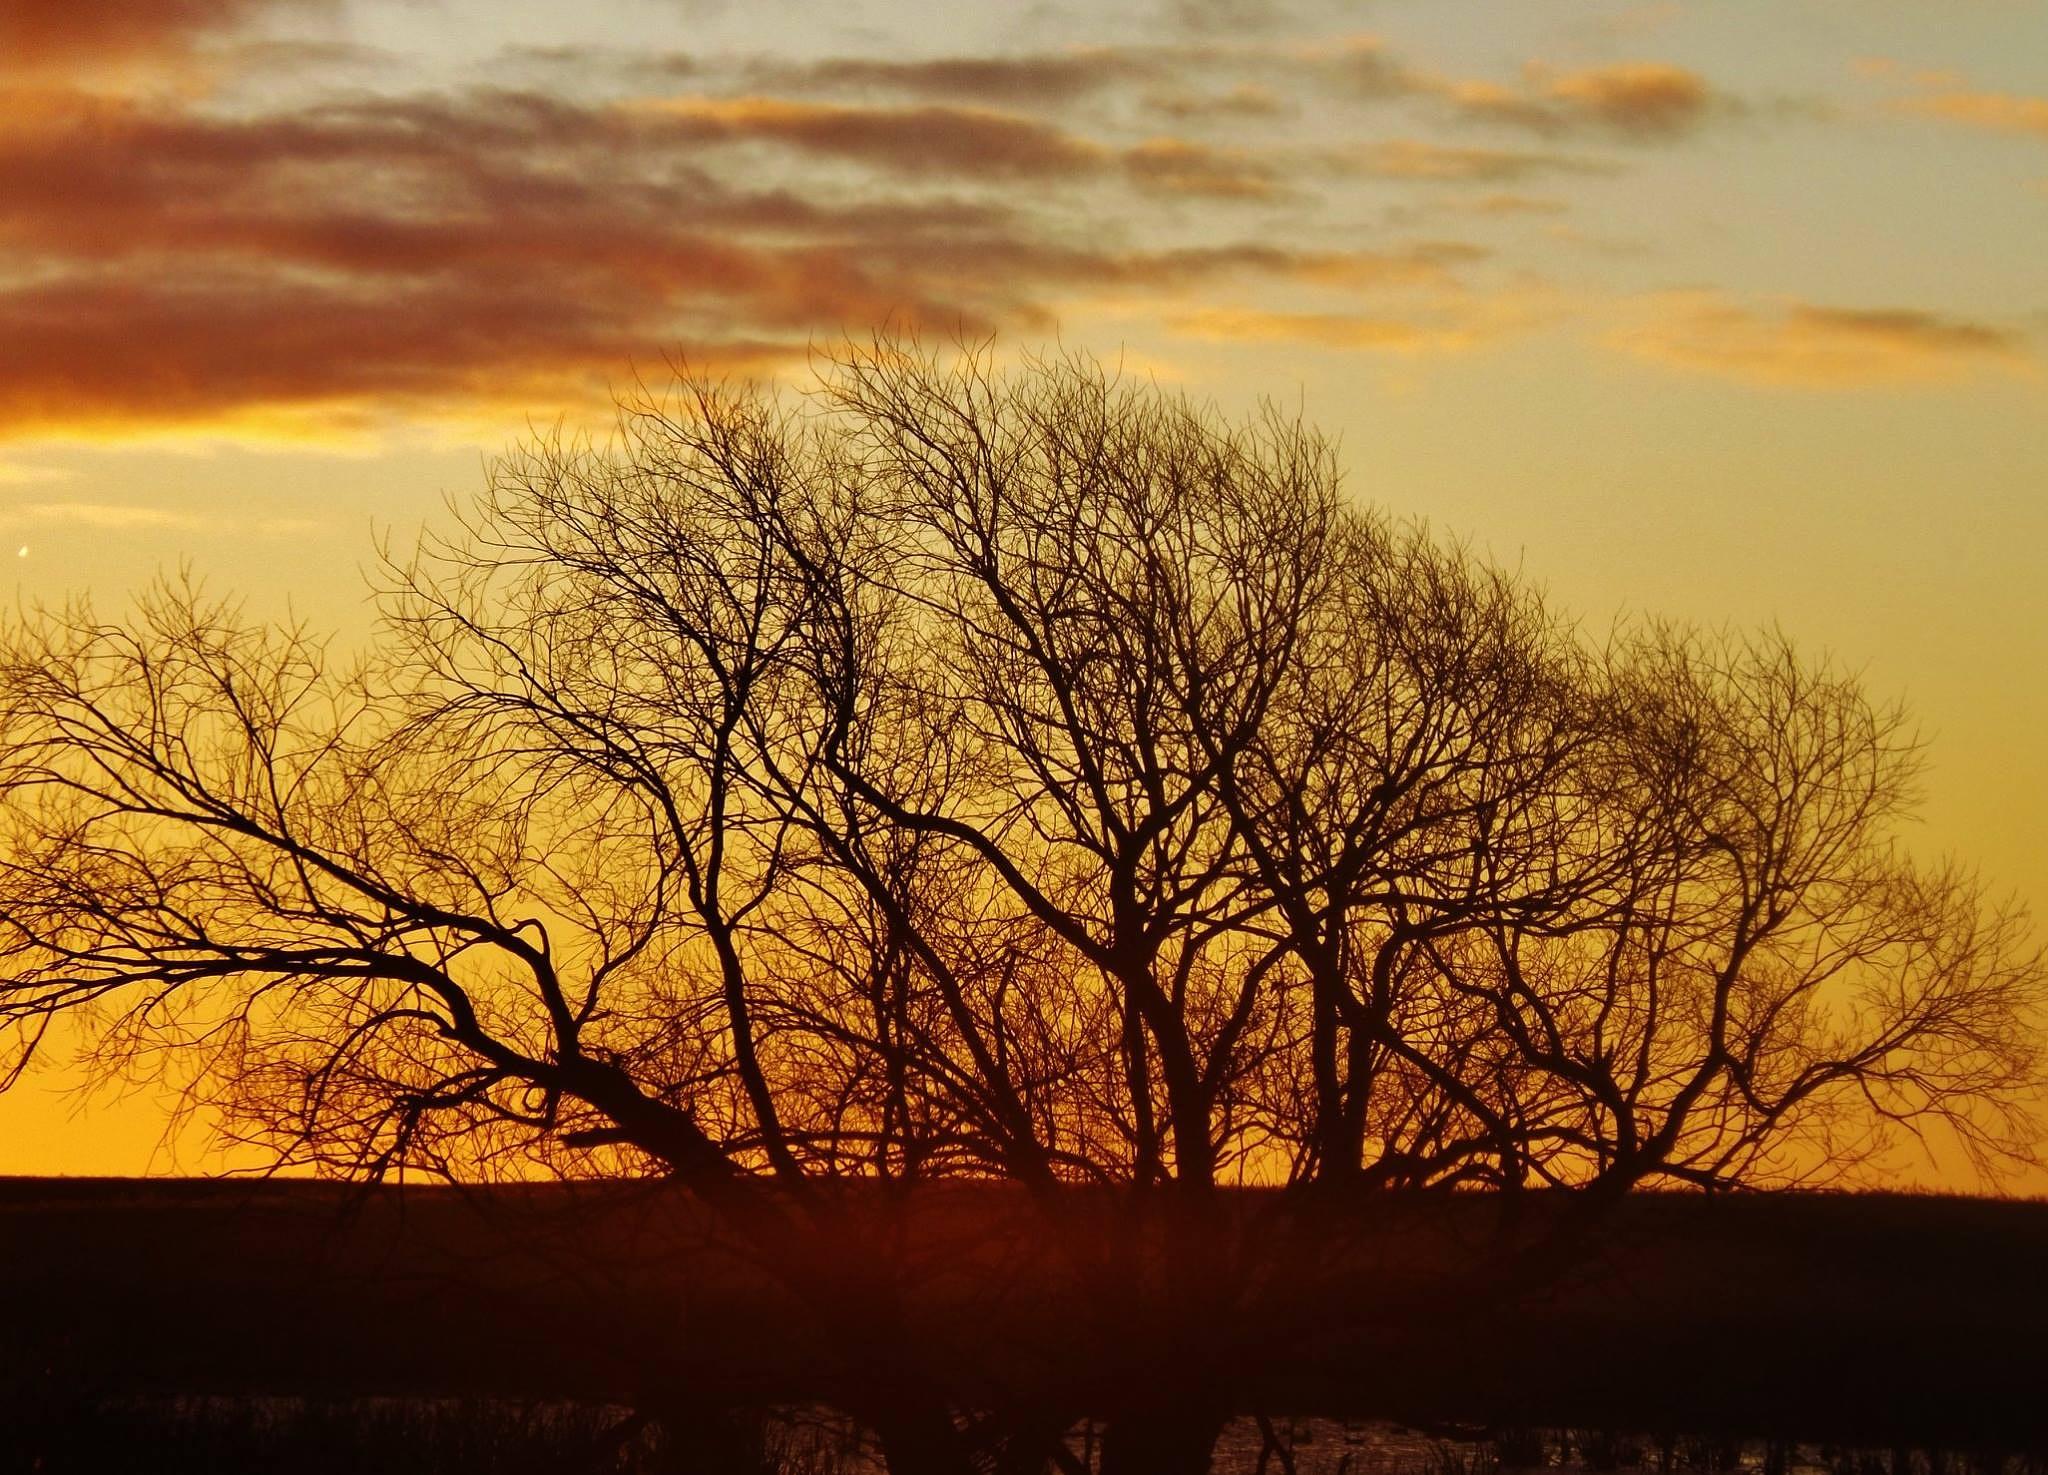 morning shot by Rhyland Cottingham